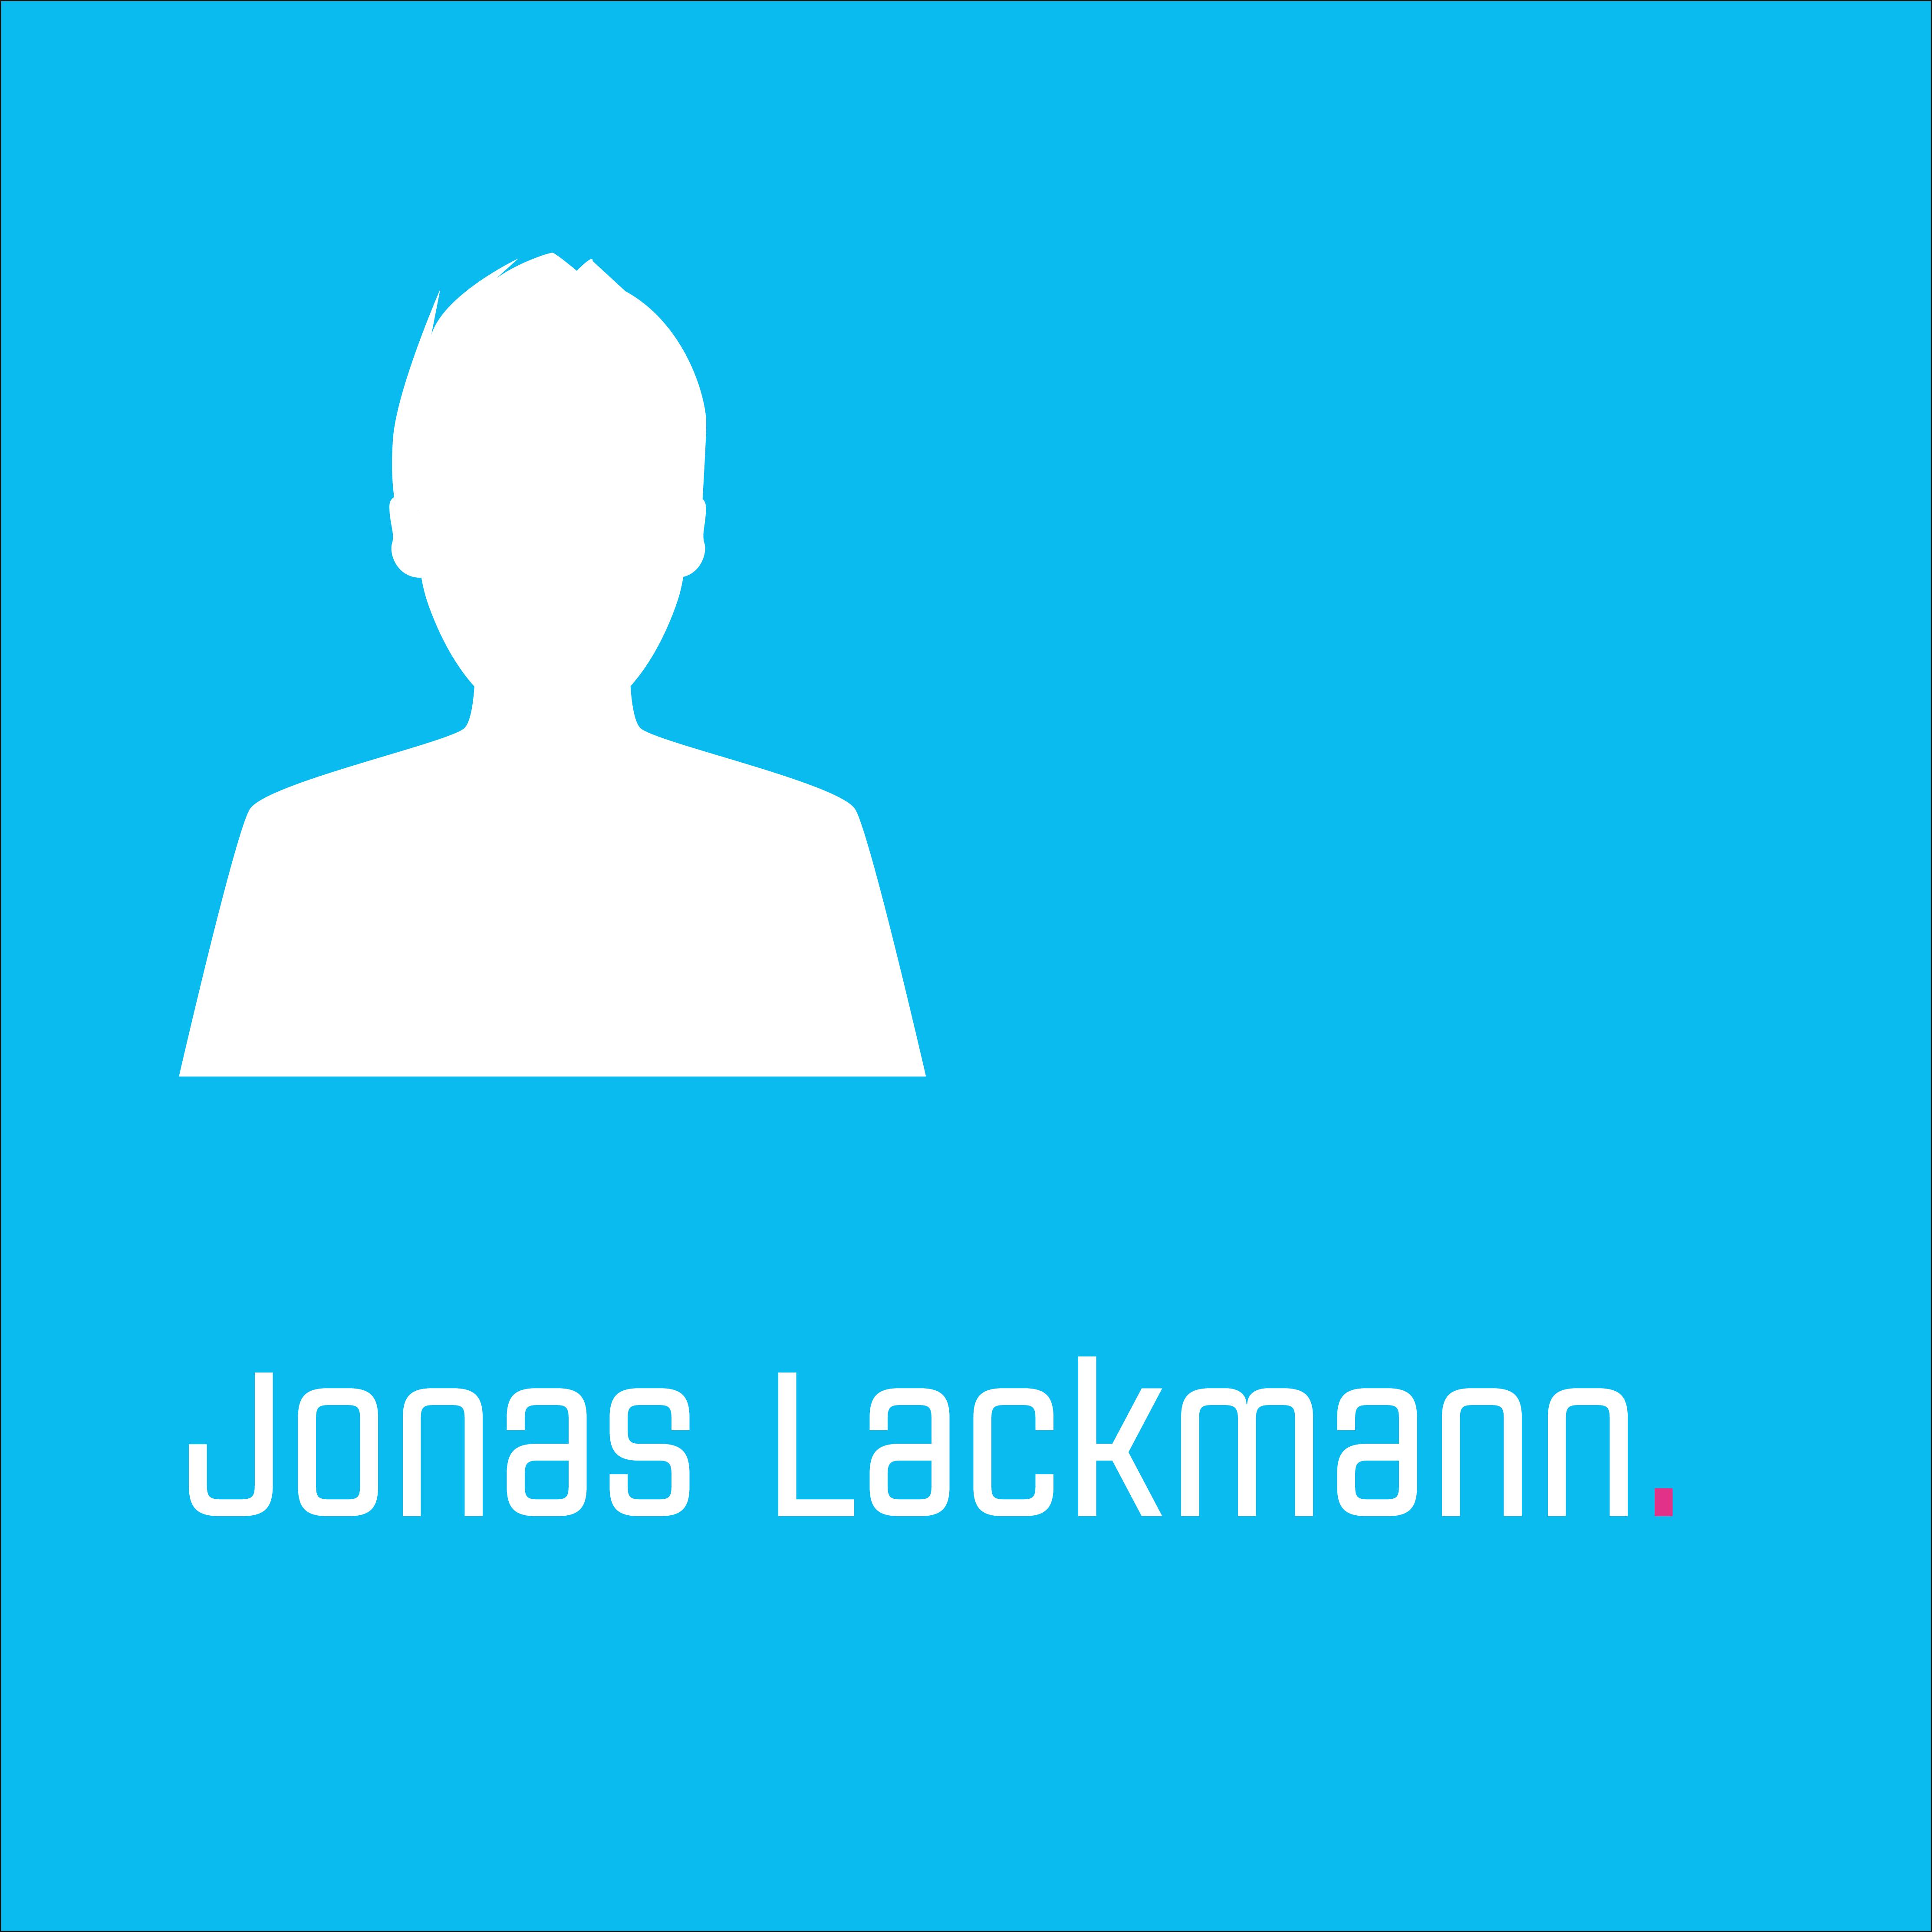 Jonas Lackmann